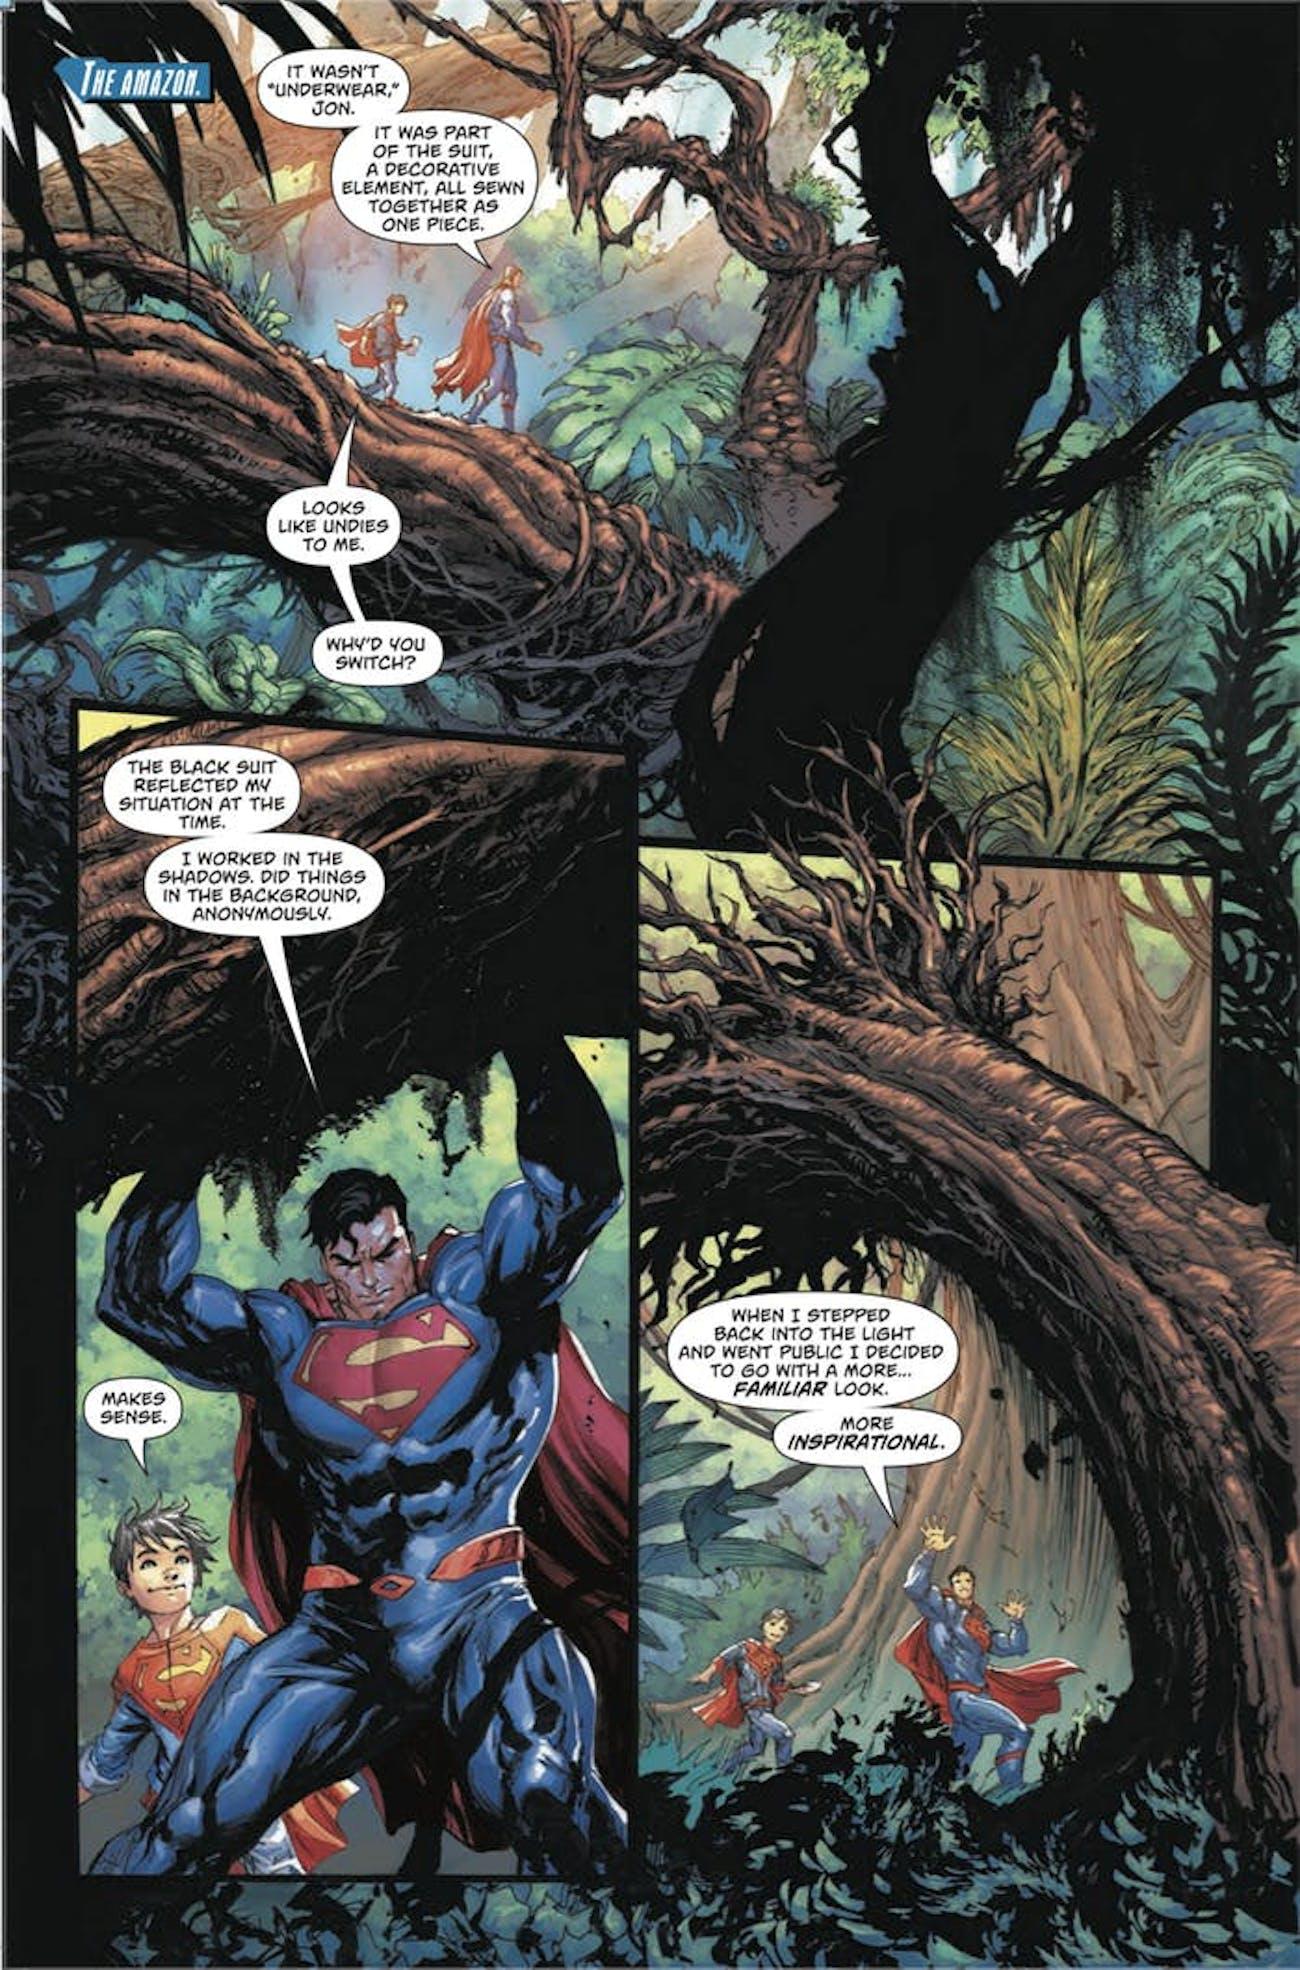 Action Comics Superman Costume